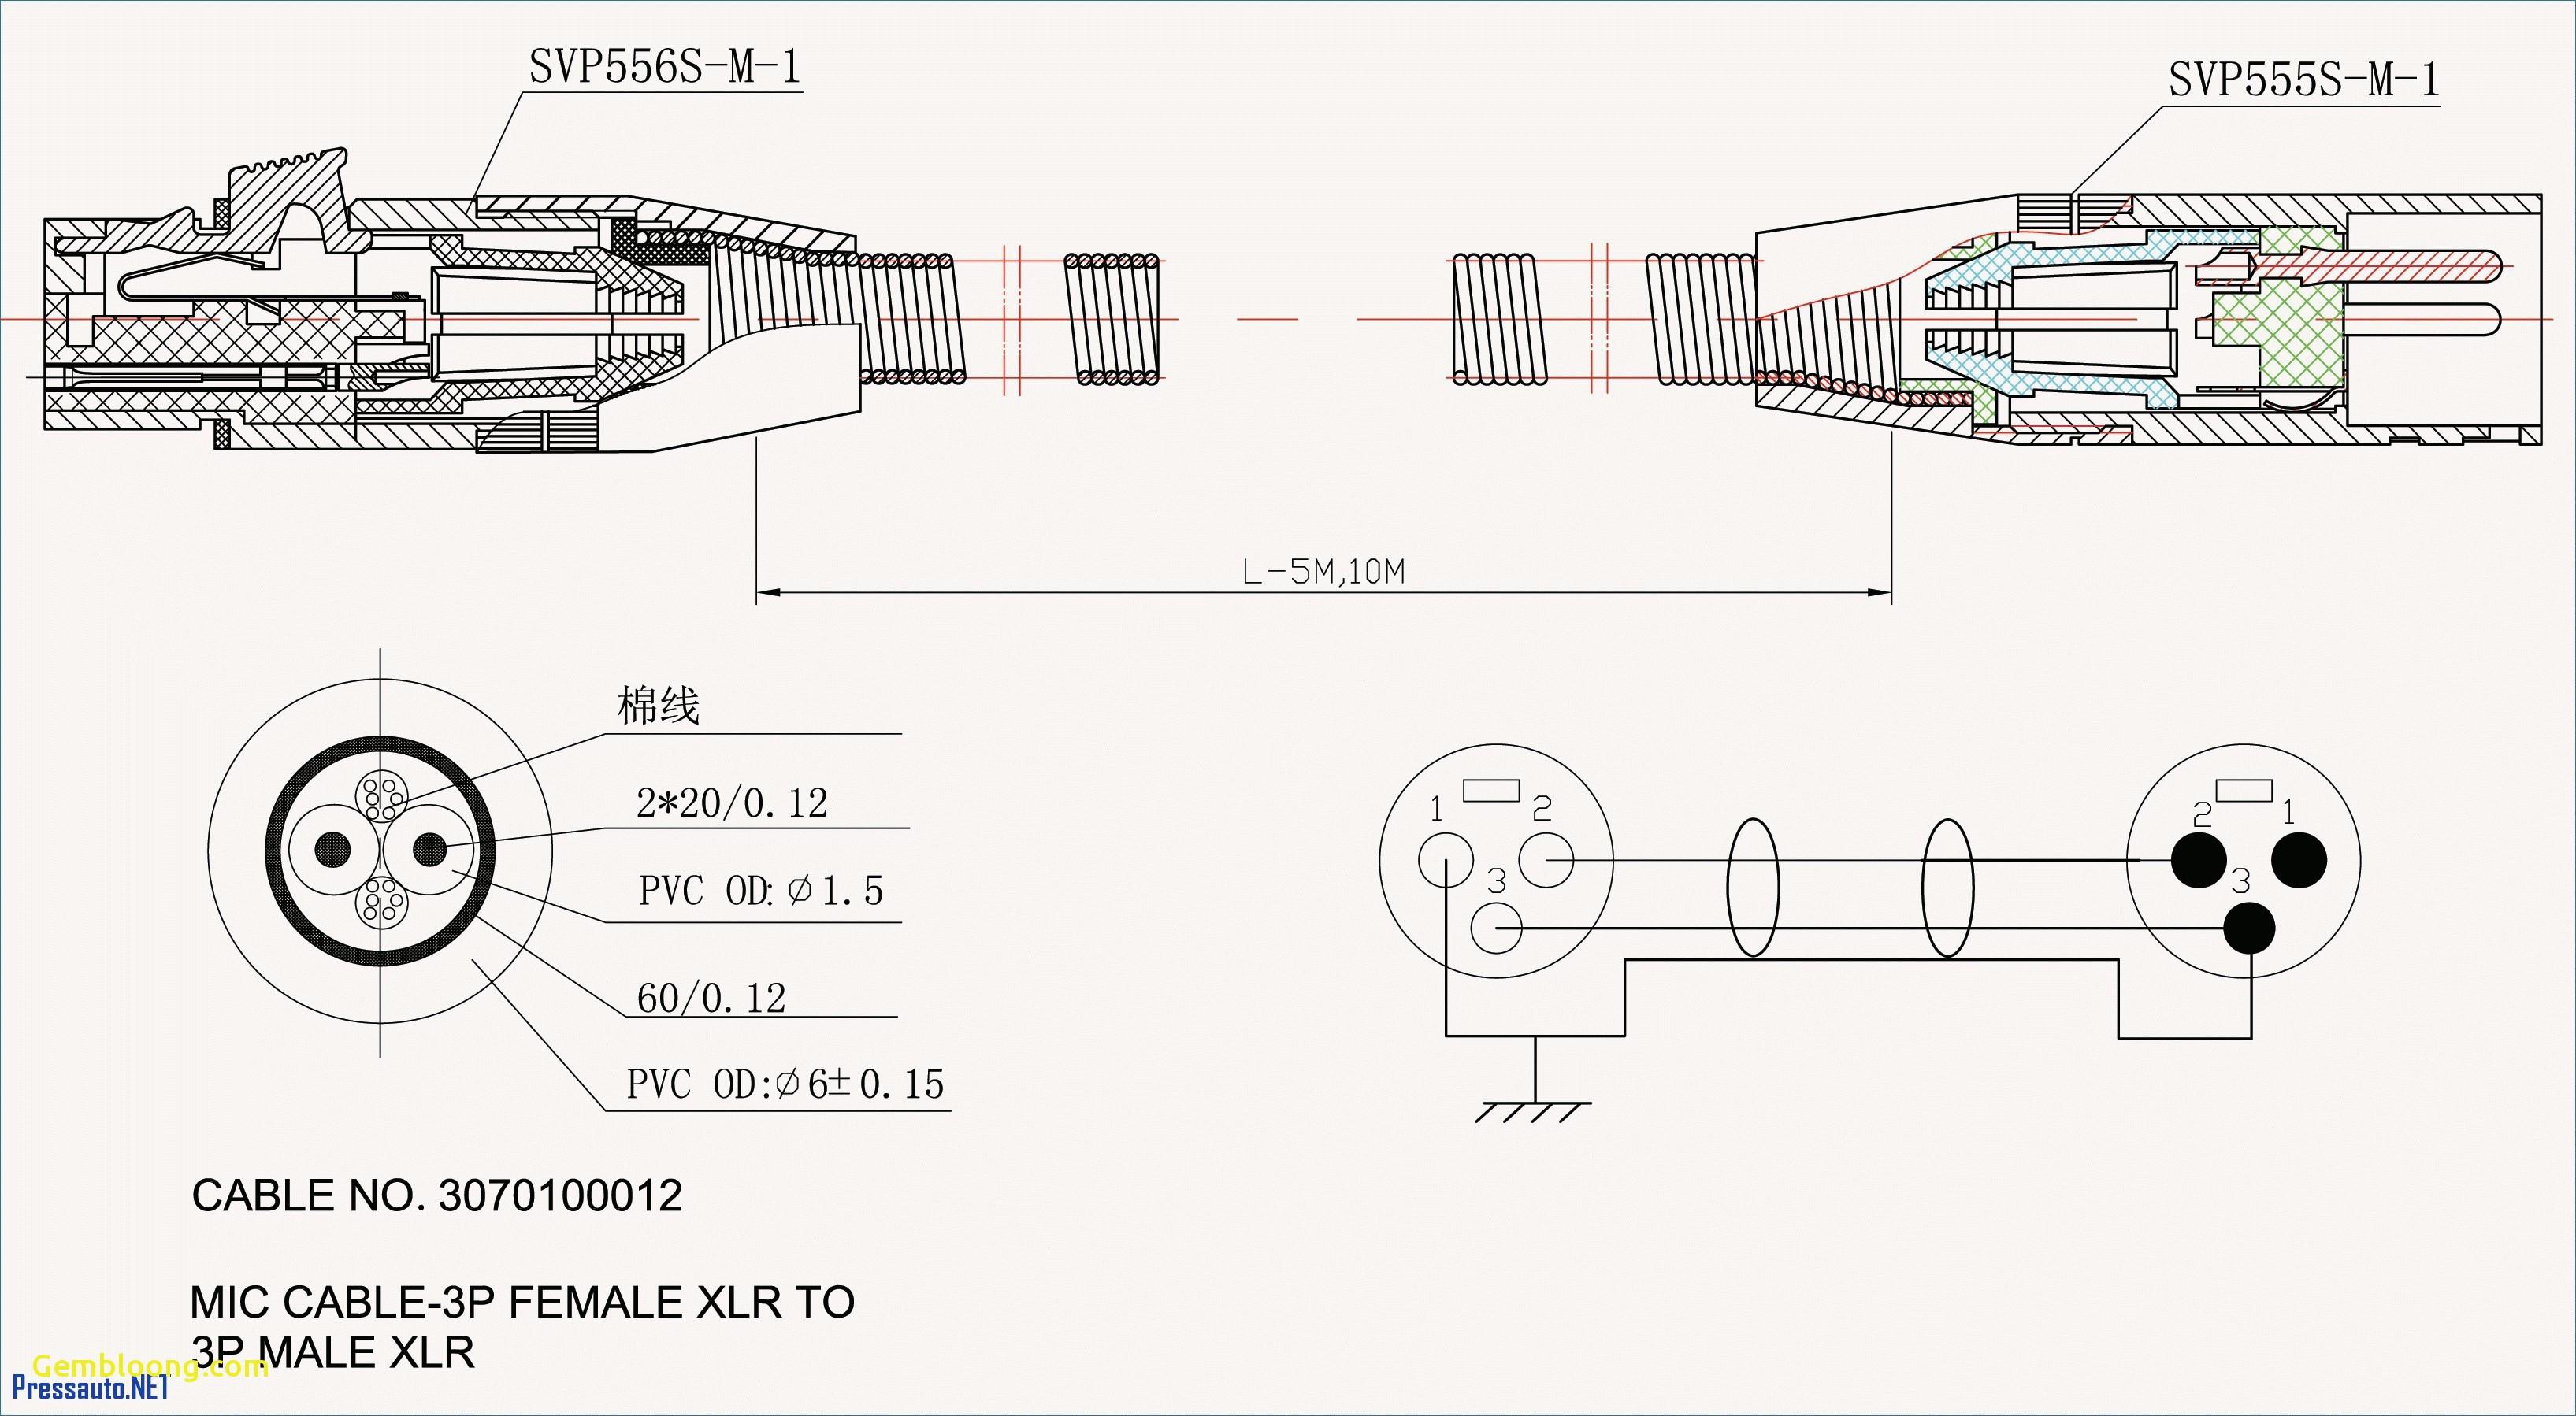 2005 ford Explorer Wiring Diagram ford 6 0l Engine Diagram Schema Wiring Diagram Of 2005 ford Explorer Wiring Diagram